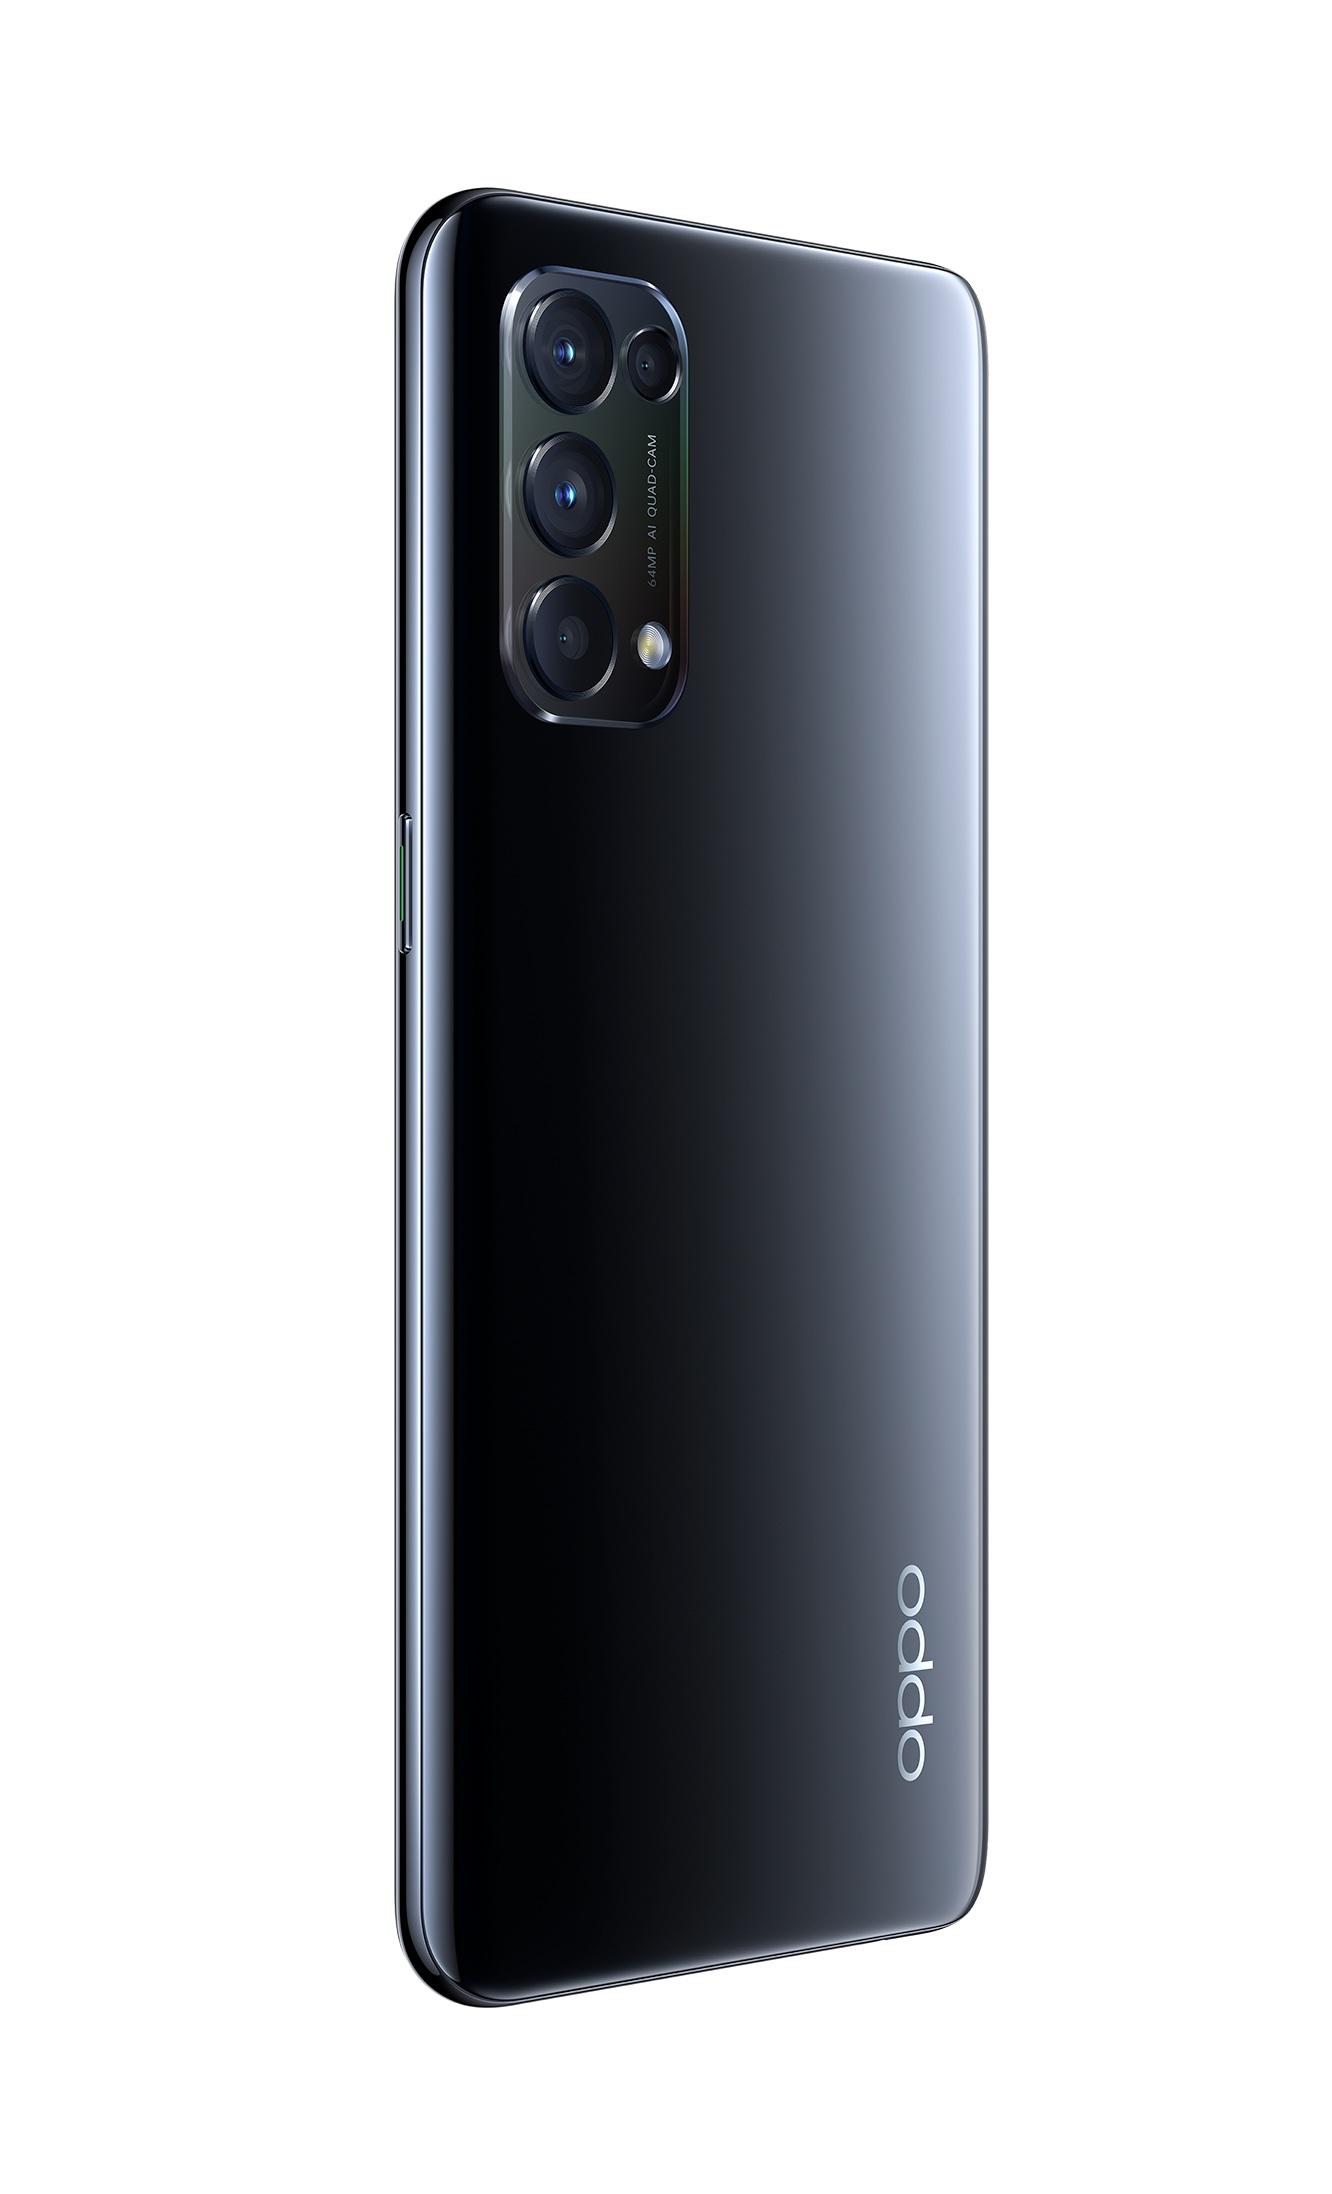 OPPO Reno5 RAM 8GB+128GB Starry Black, RENO5-128GBBK, CPH2211